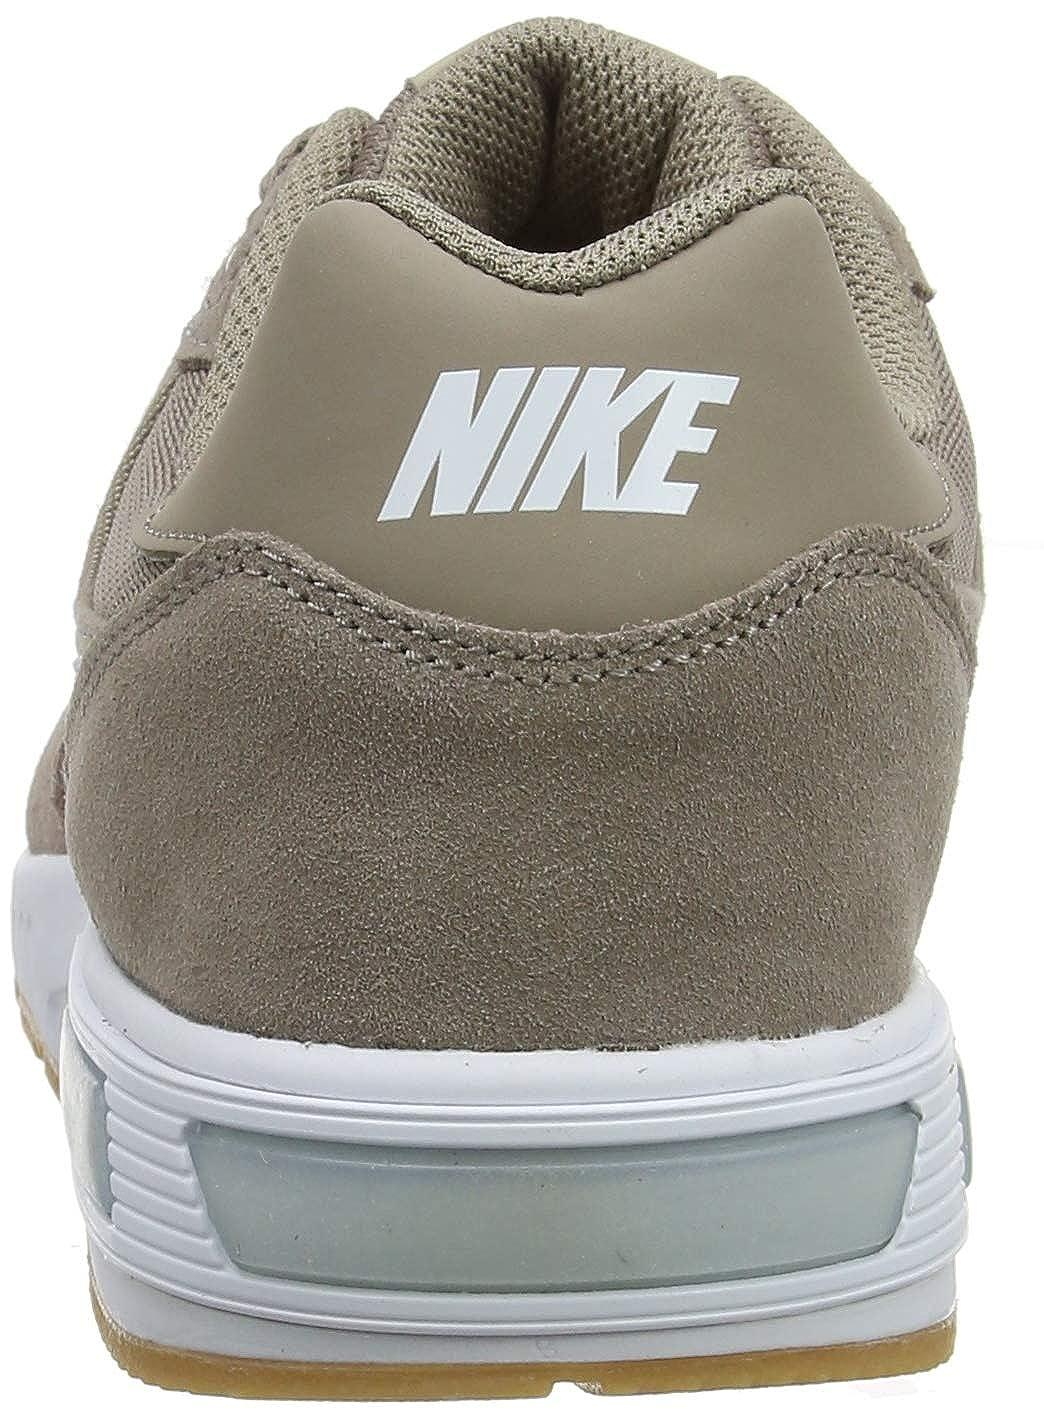 Nike Herren Nightgazer 644402 201 Sneaker, grün: